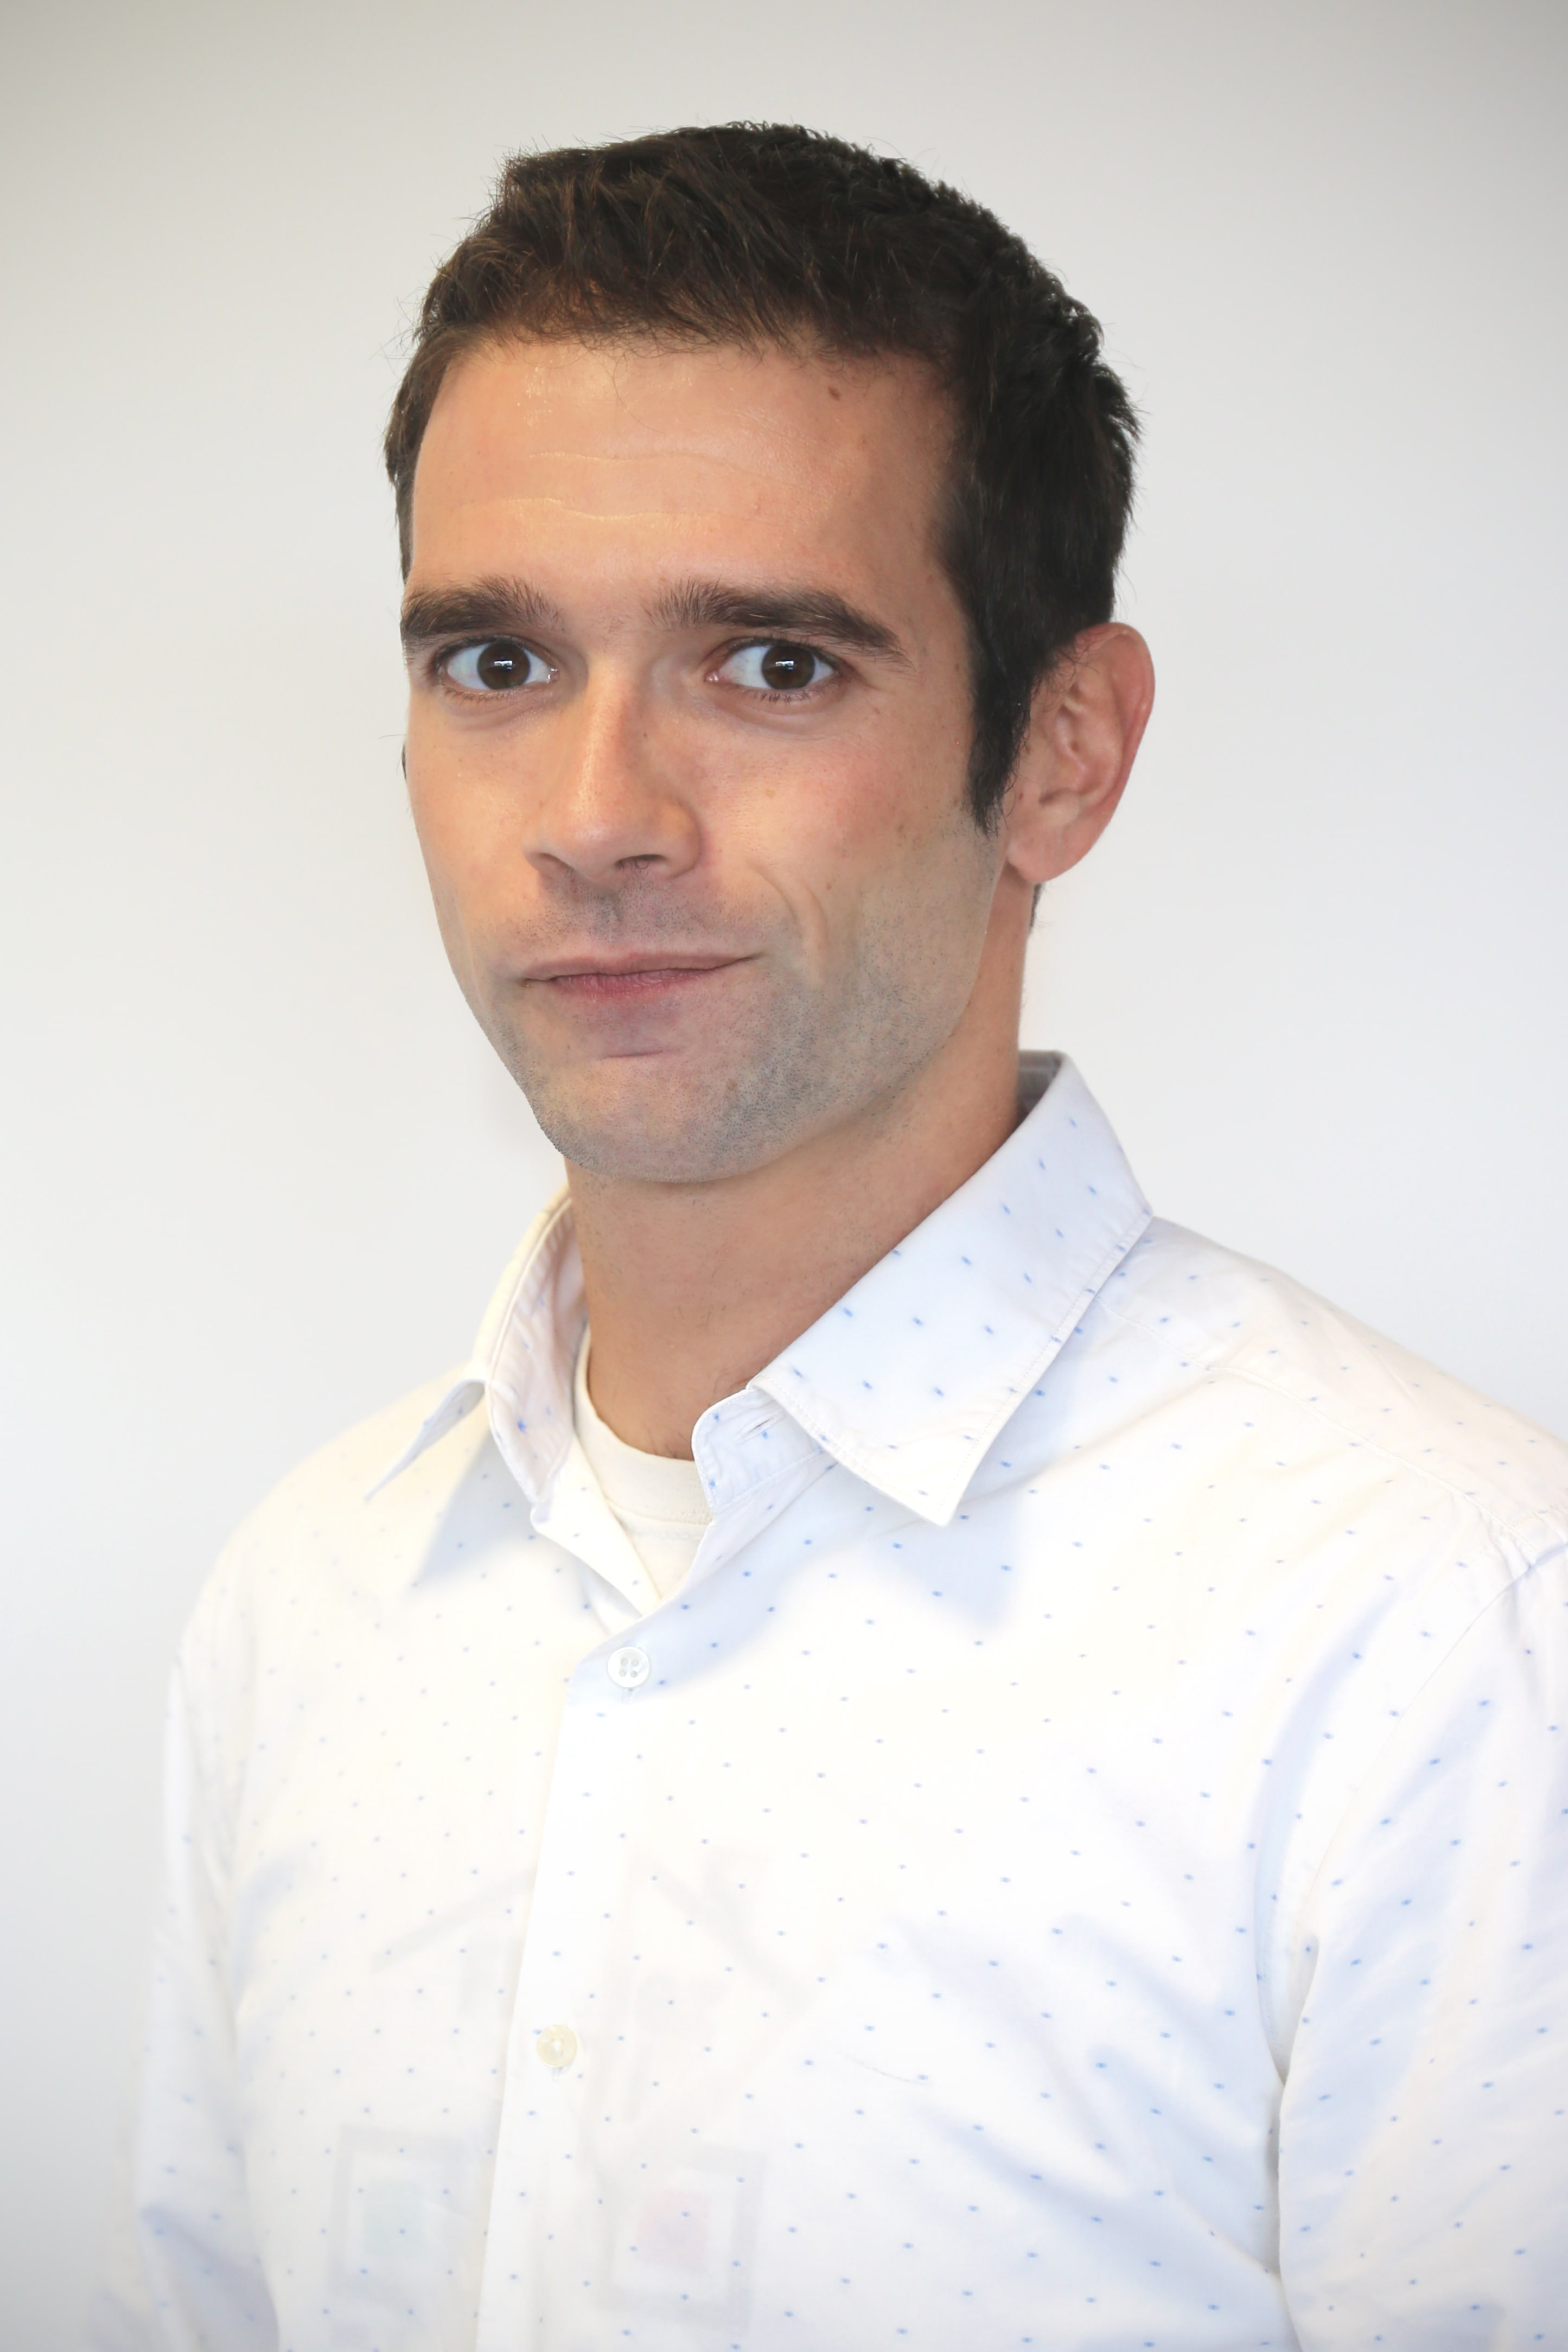 Guillaume Dumas - Enseignant-chercheur Montpellier Management